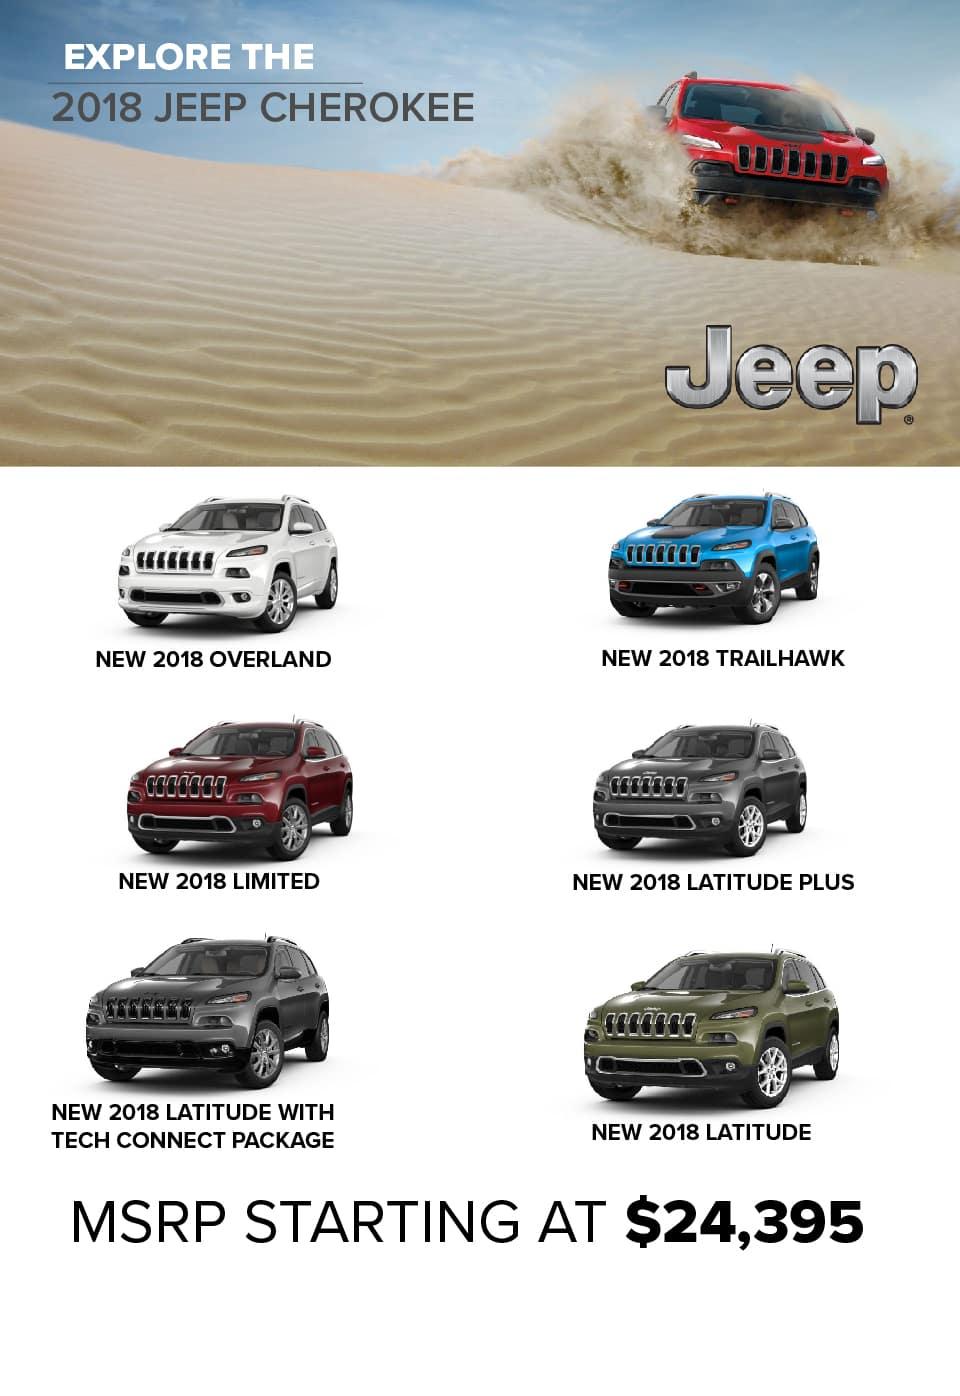 2018 Jeep Cherokee Trim's Banner